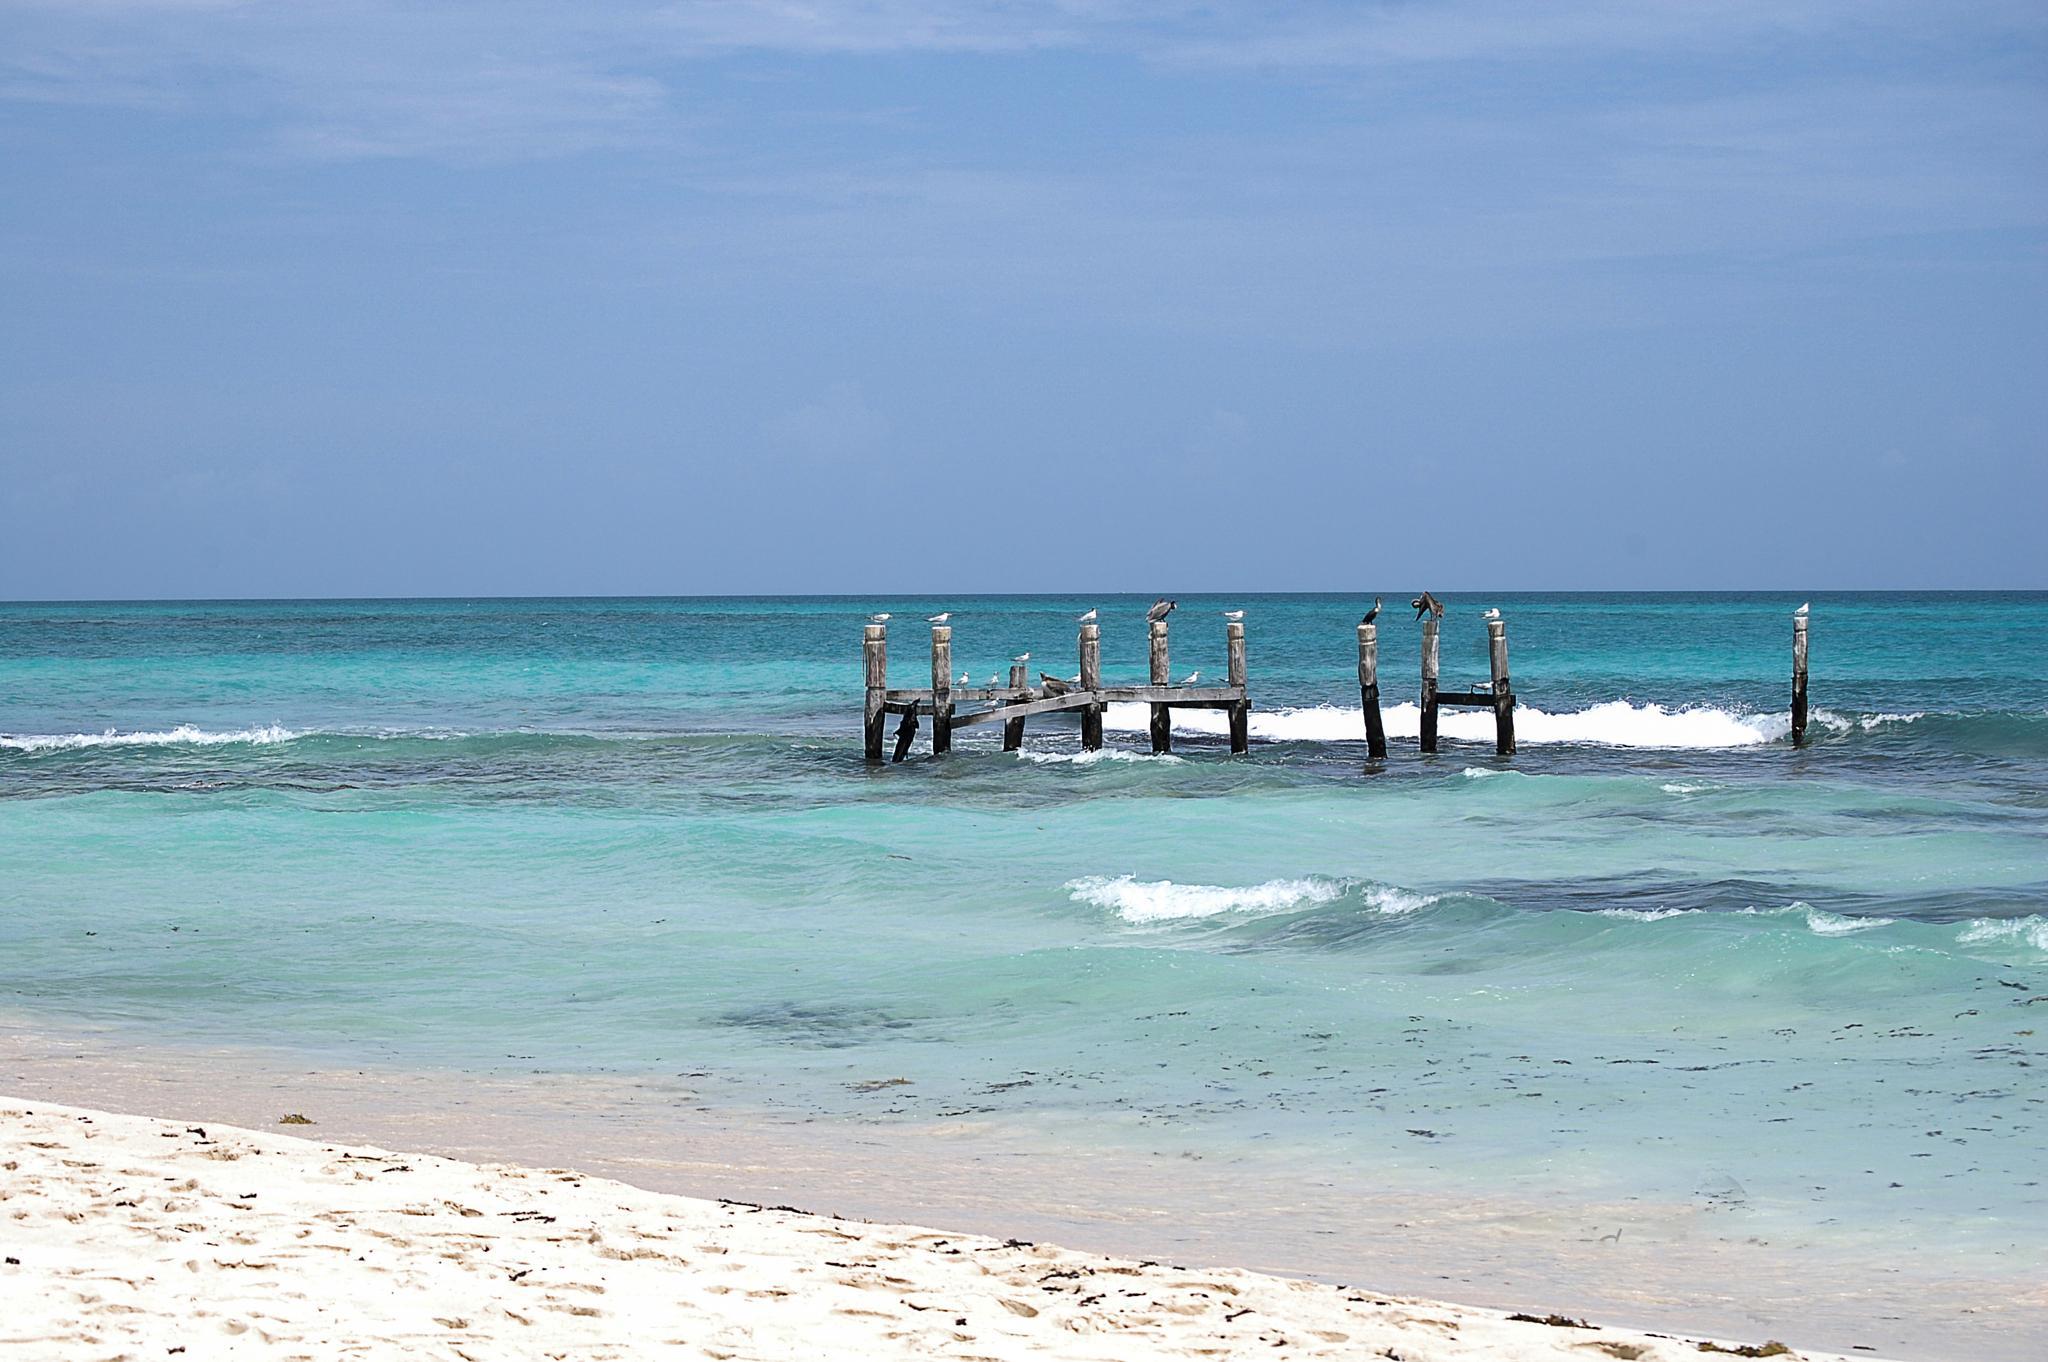 Sea mexico by linda.boisvert.359